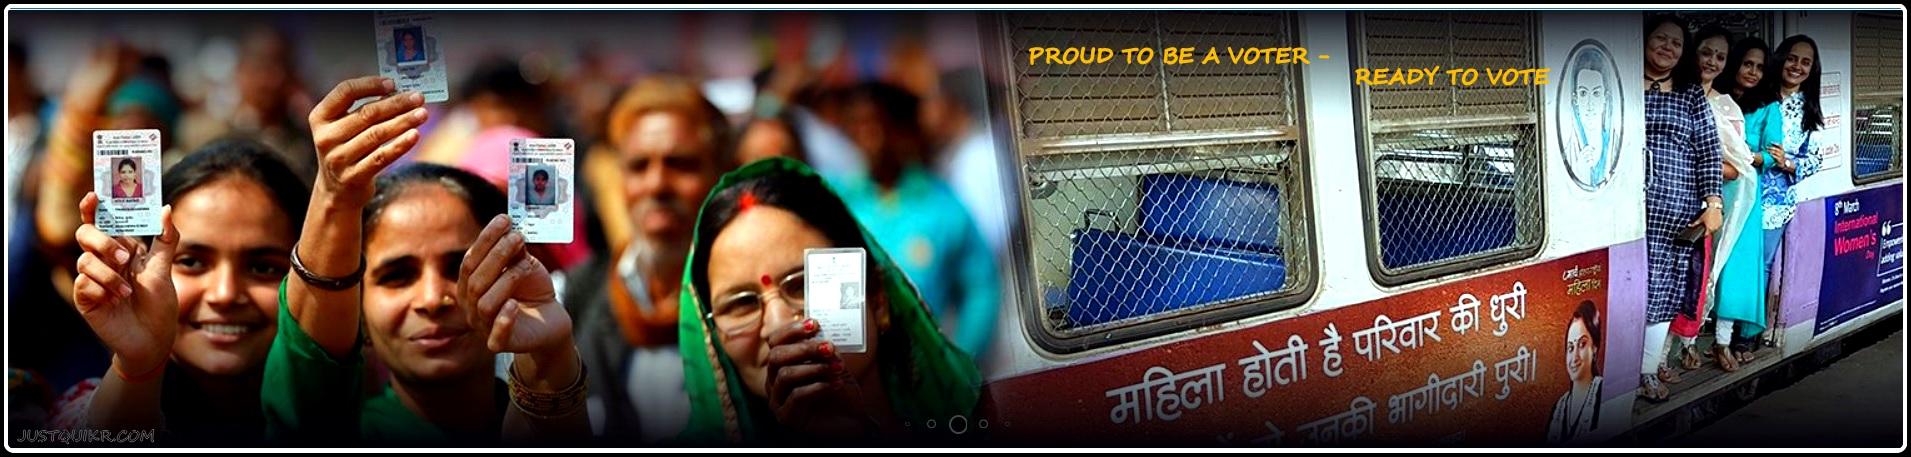 National voters Day / Rashtriya Matdata Diwas